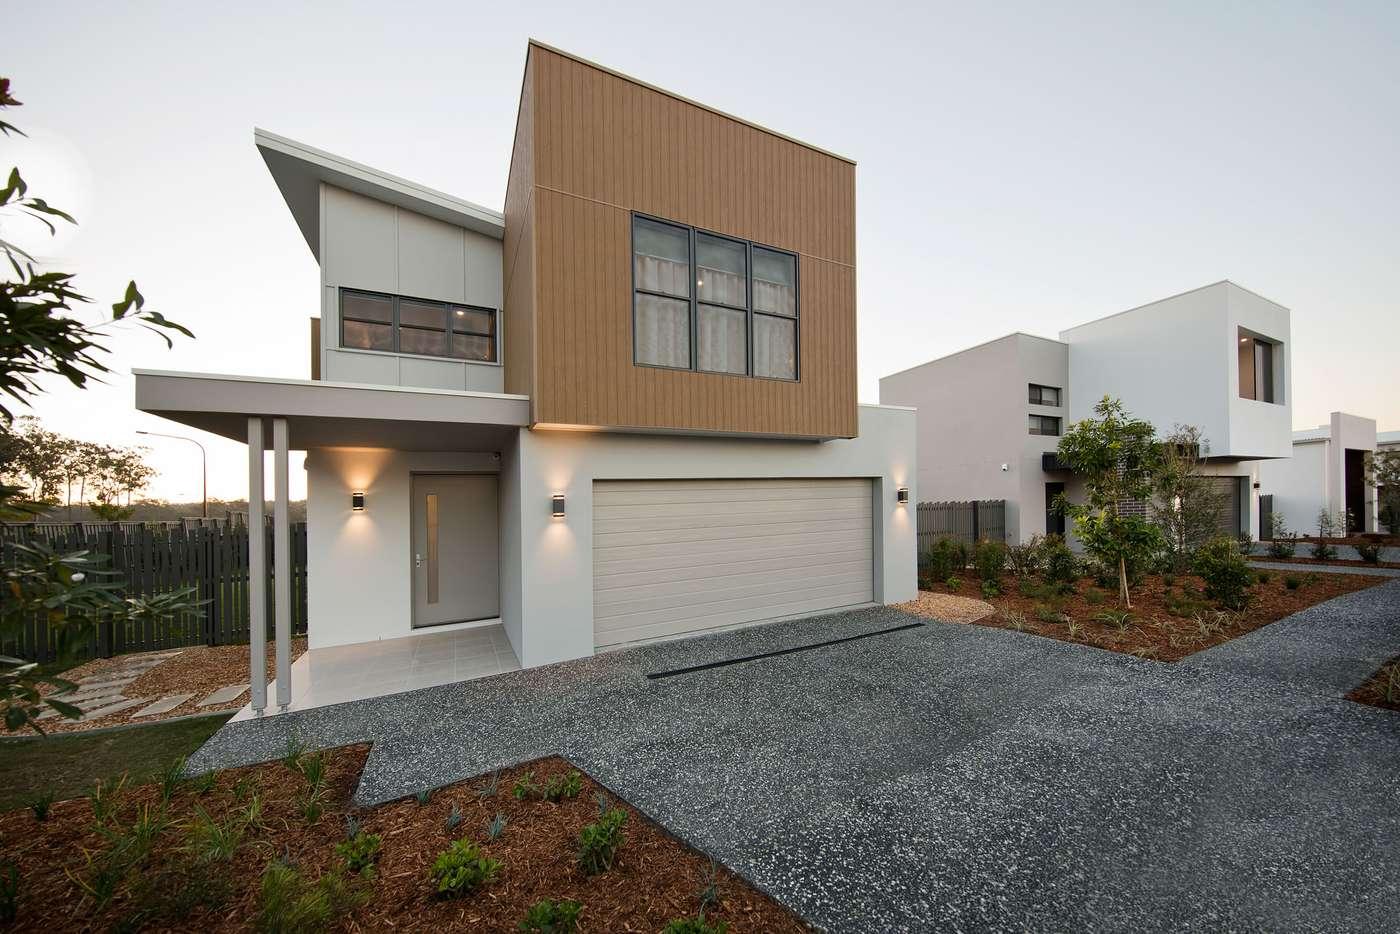 Main view of Homely house listing, 323 BURPENGARY ROAD, Narangba, QLD 4504